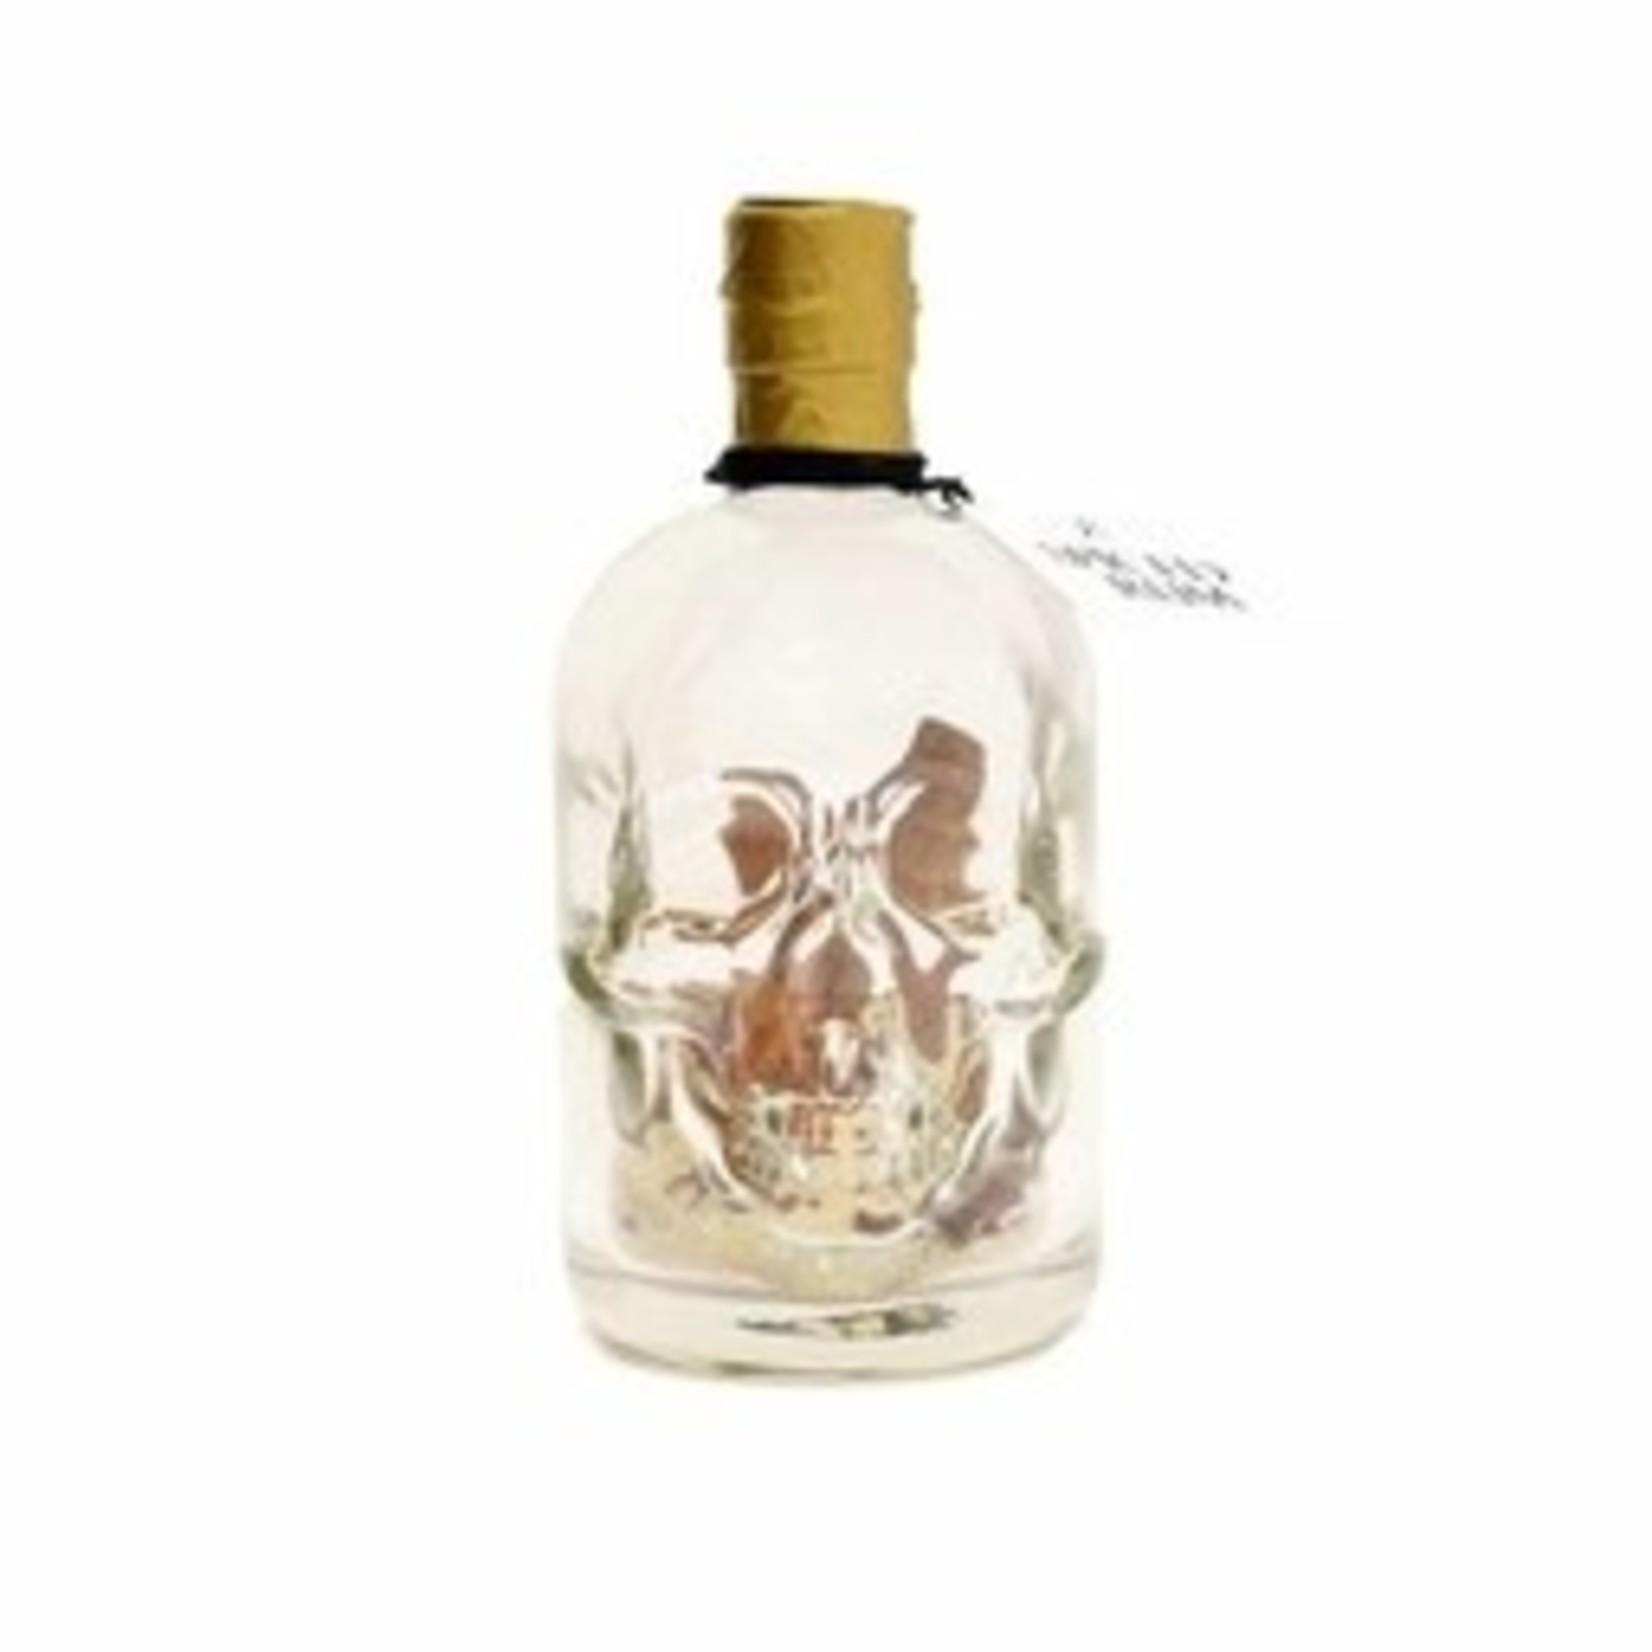 Spiced Rum - Festival in a Bottle